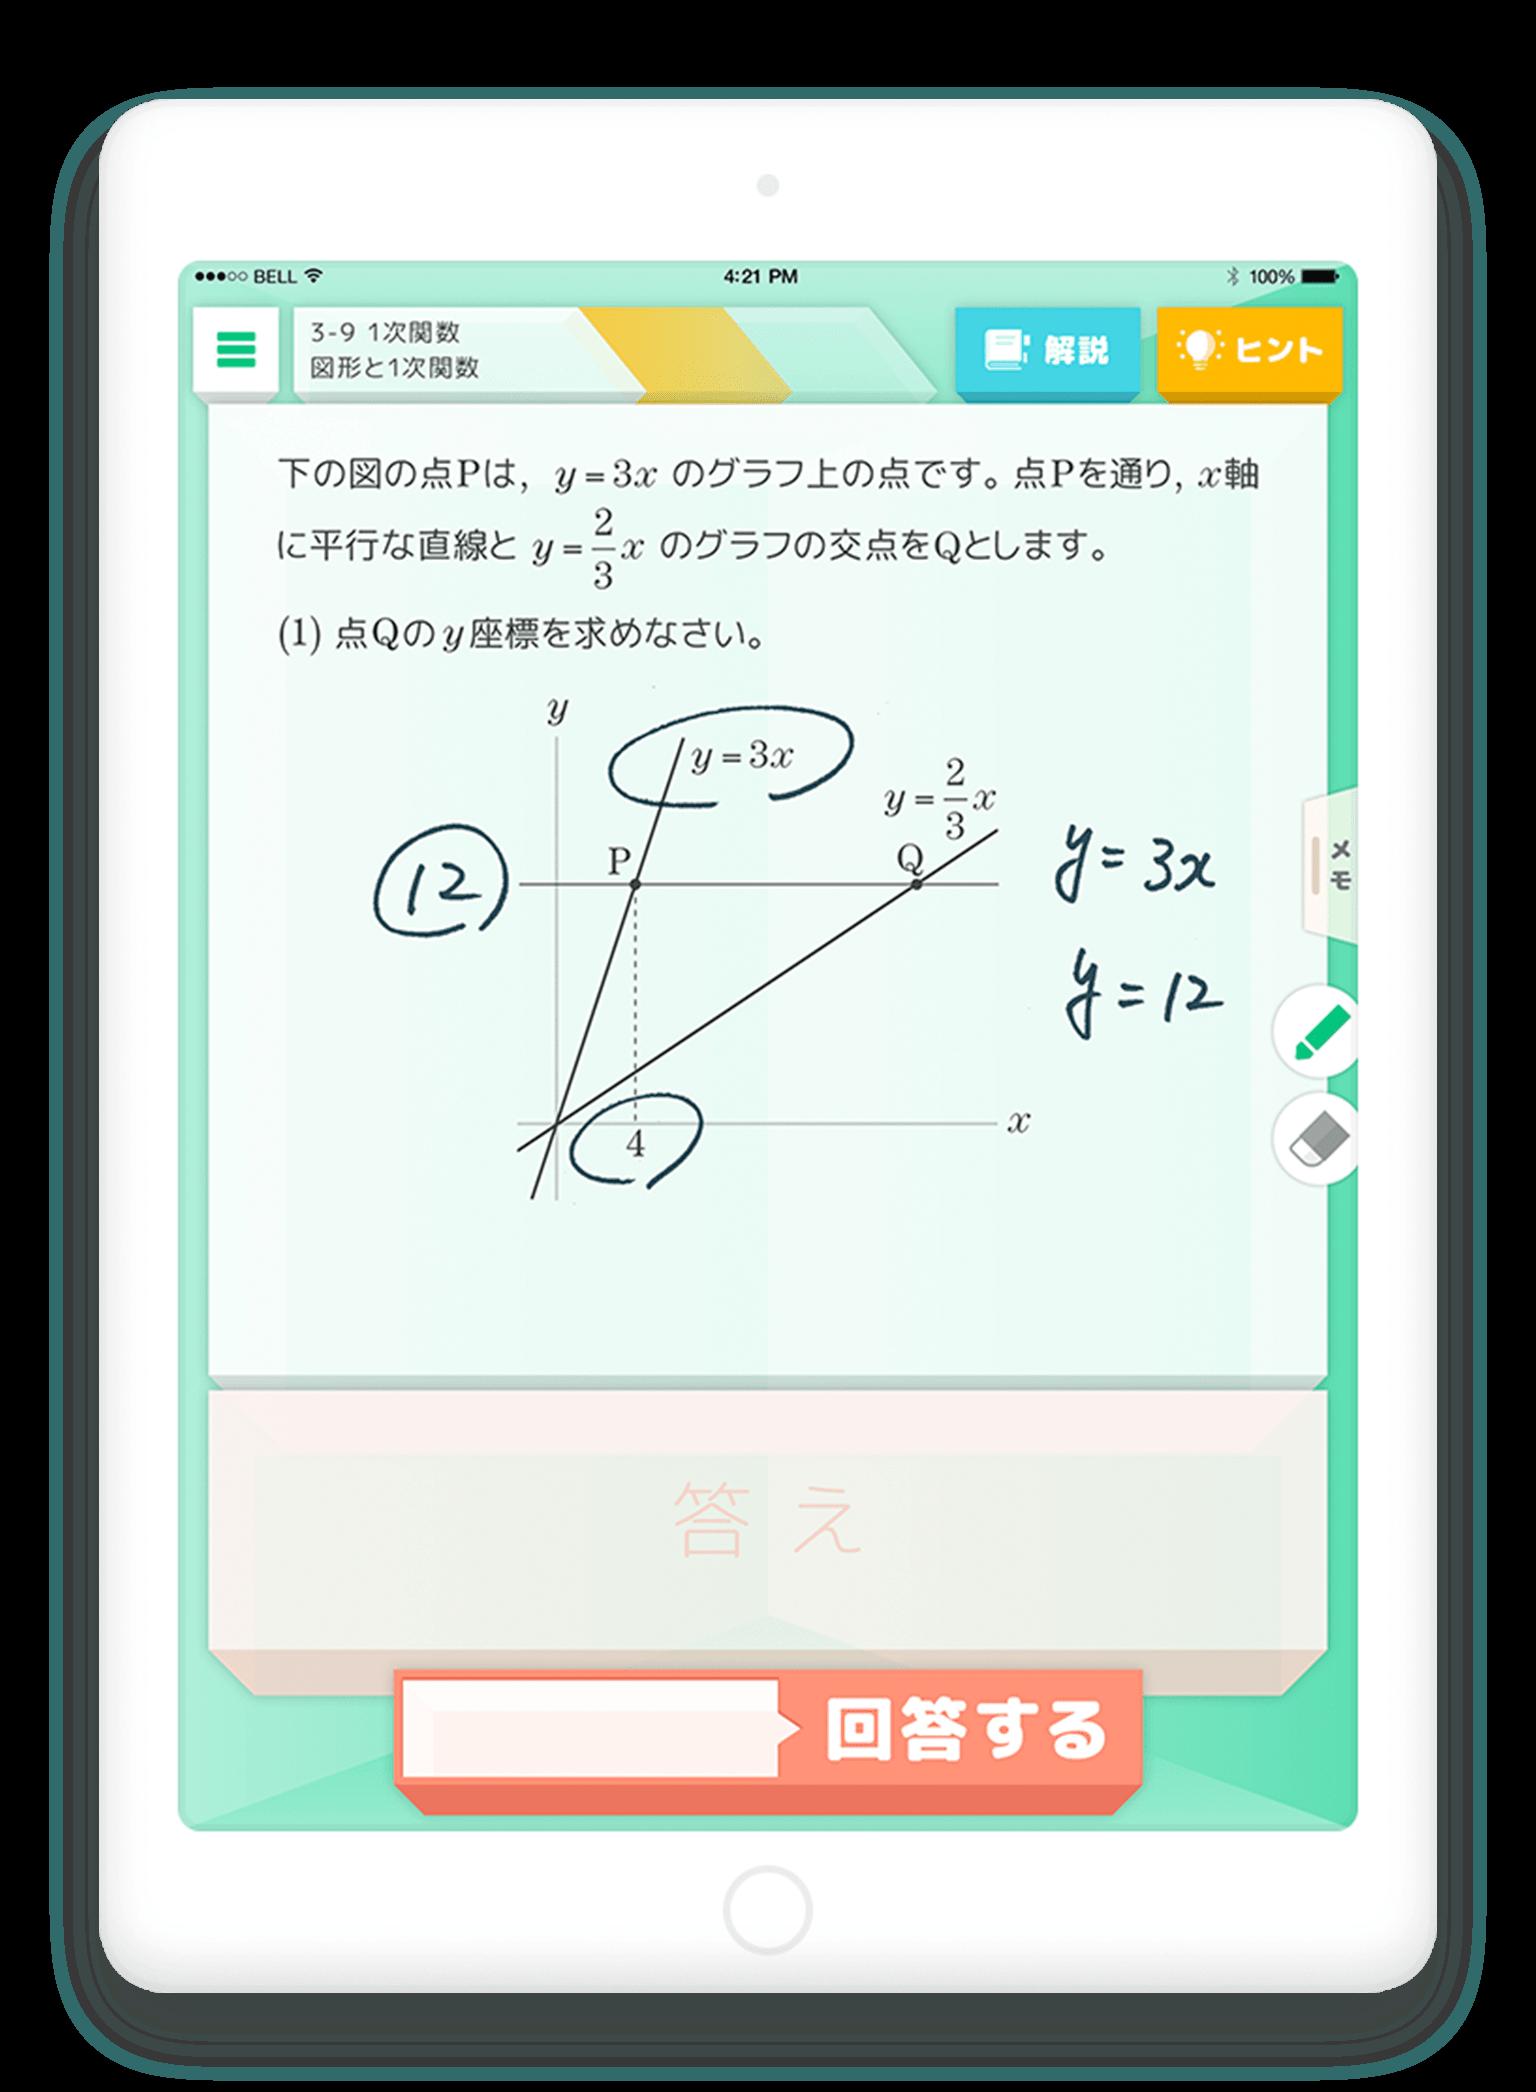 D24557-39-814368-0